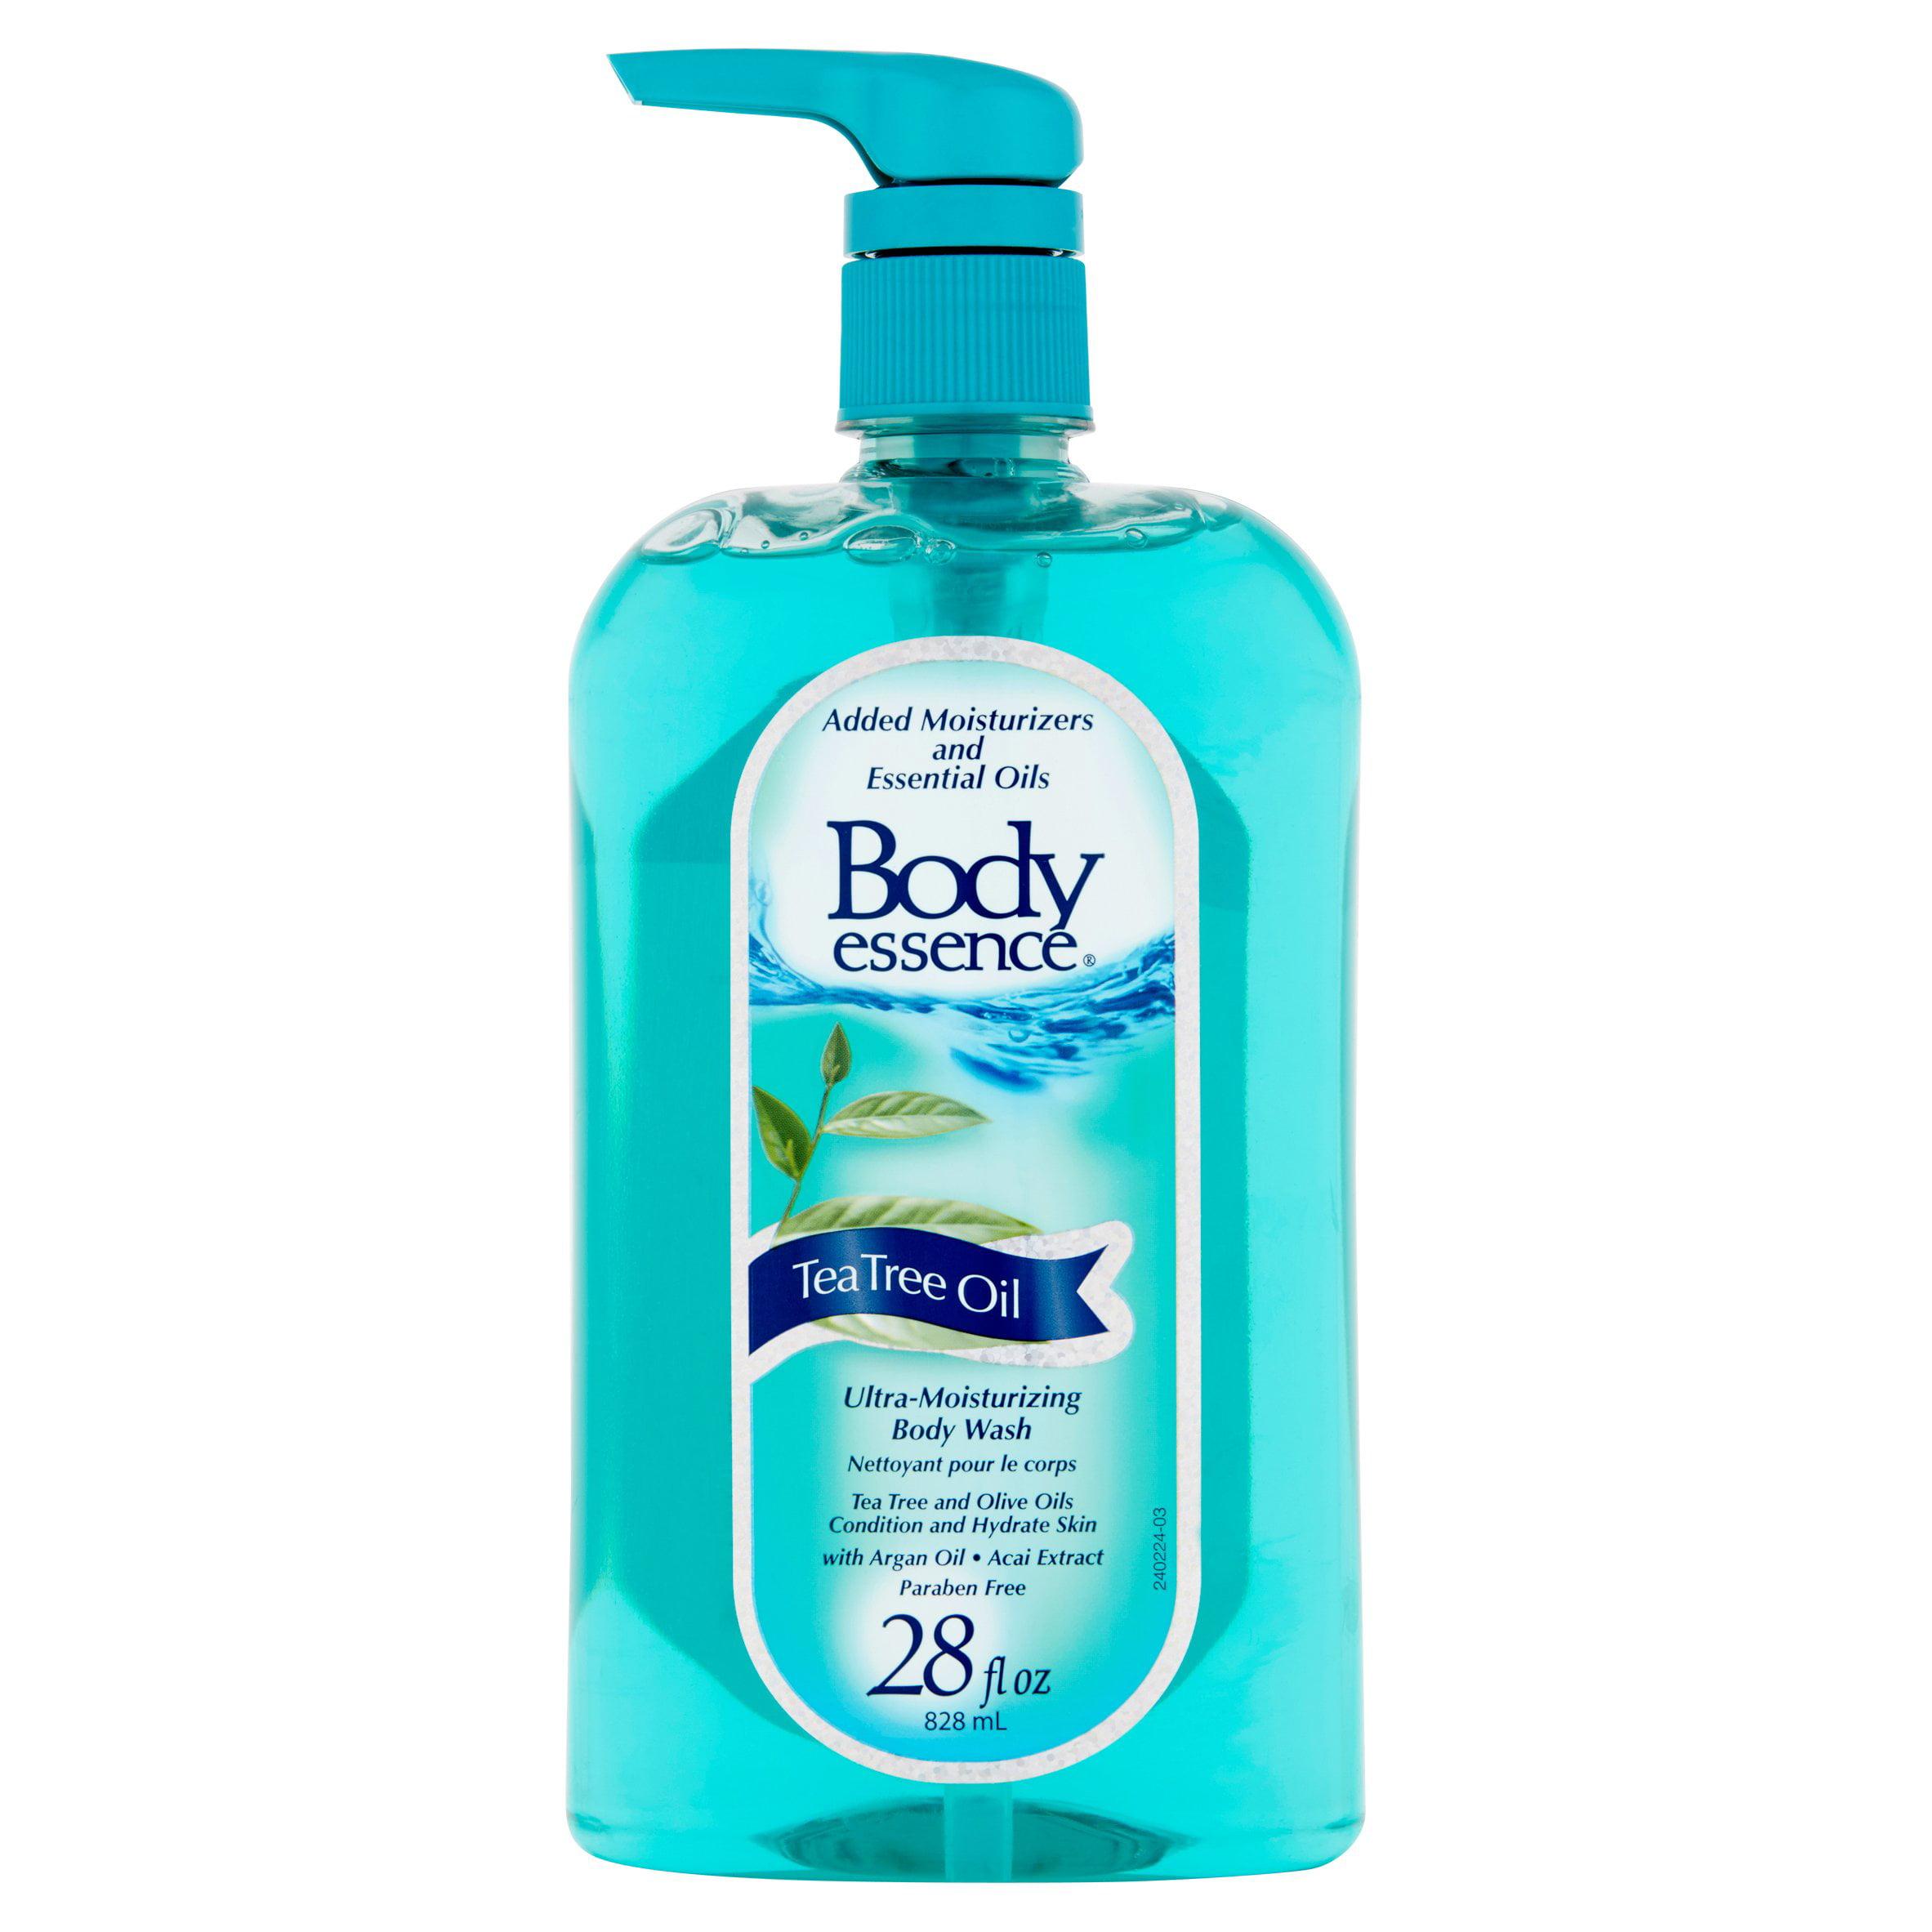 (2 pack) Body Essence Tea Tree Oil Ultra-Moisturizing Body Wash, 28 fl oz